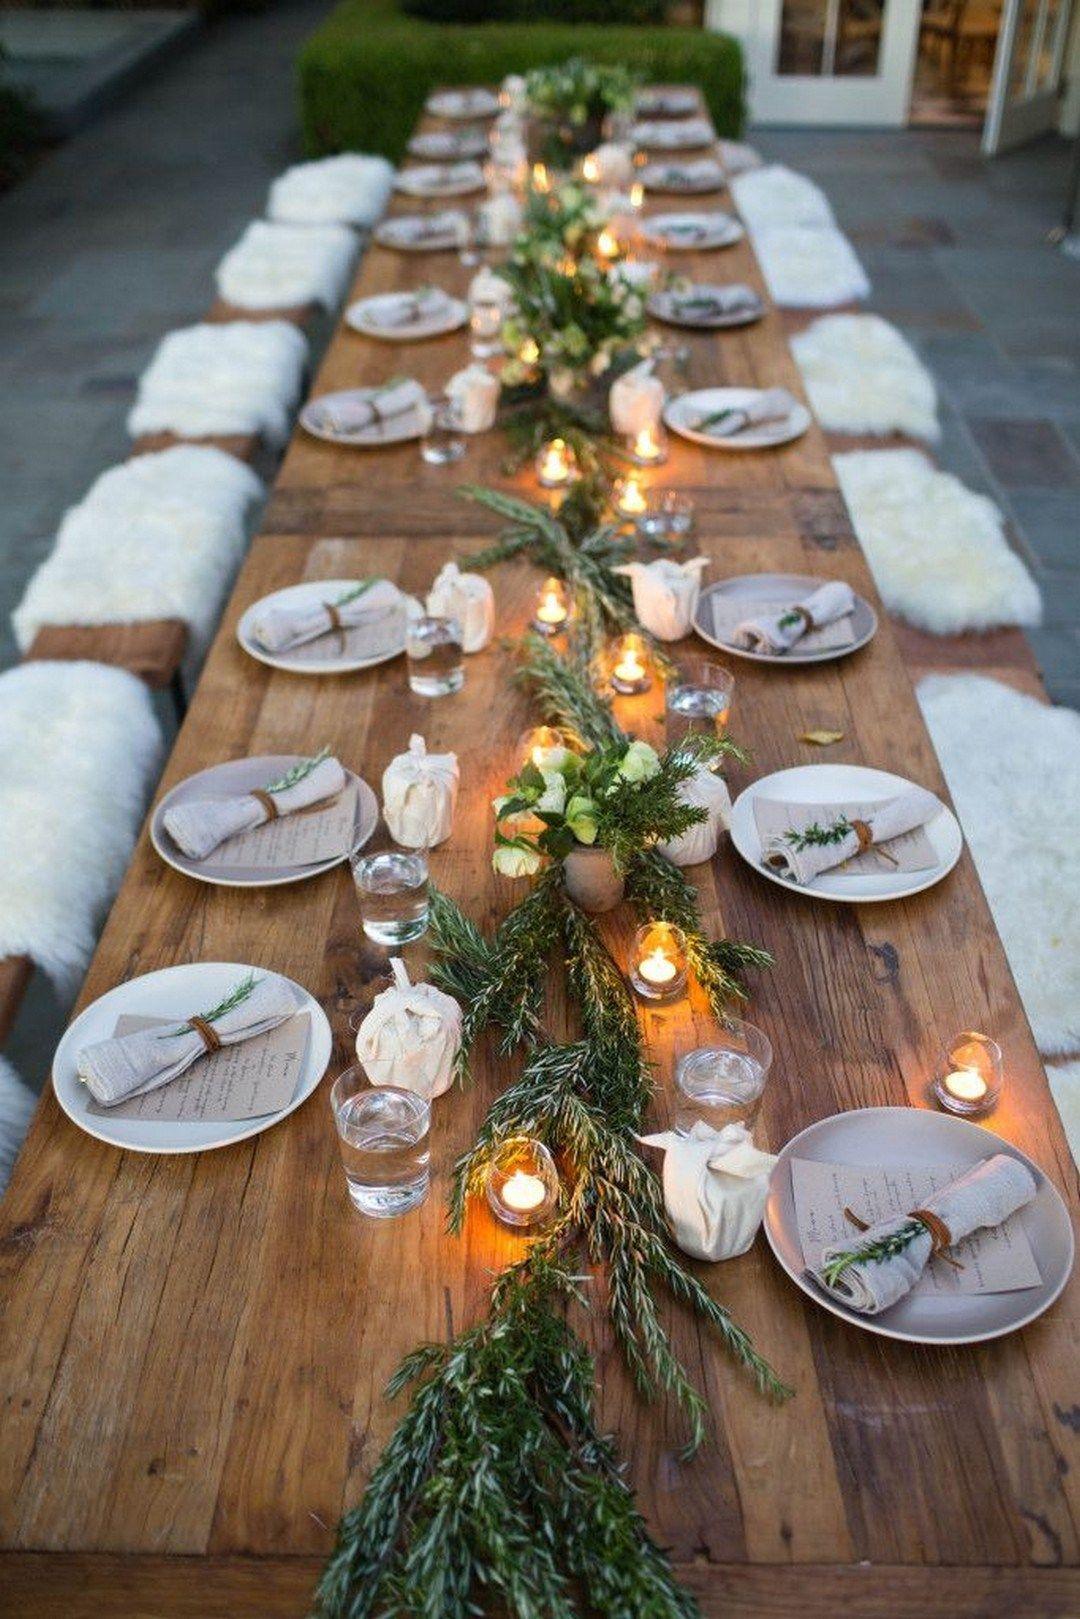 Wonderful Weddings Wonderful Wedding Table Setting Ideas 48 Inspirati. & Wonderful Wedding Table Setting Ideas 48 Inspiration Photos (26 ...